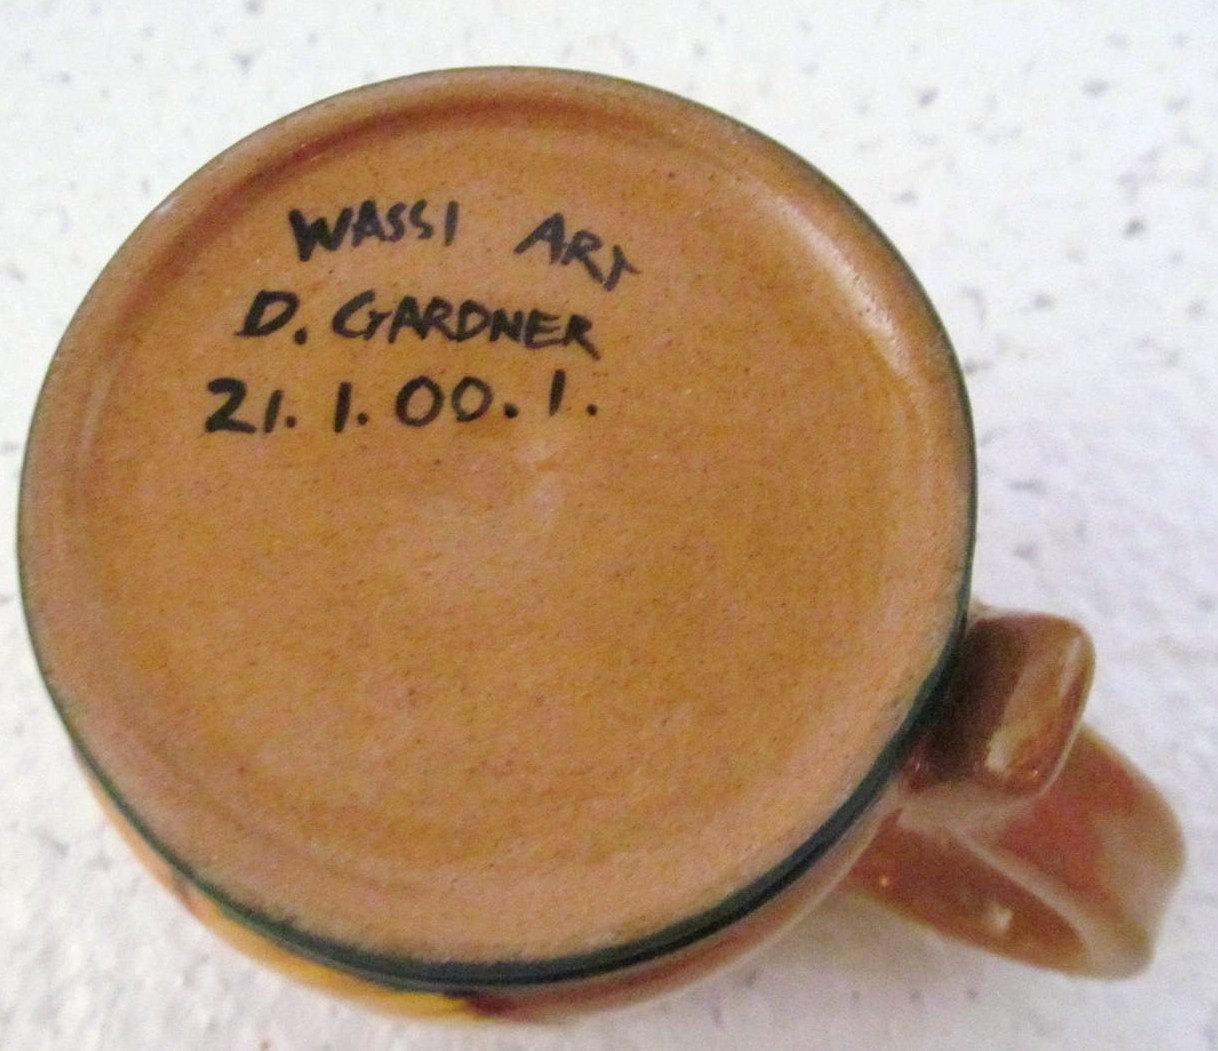 2001 Wassi Art Jamaica Handmade & Painted Ceramic Mug Dwayne Gardner